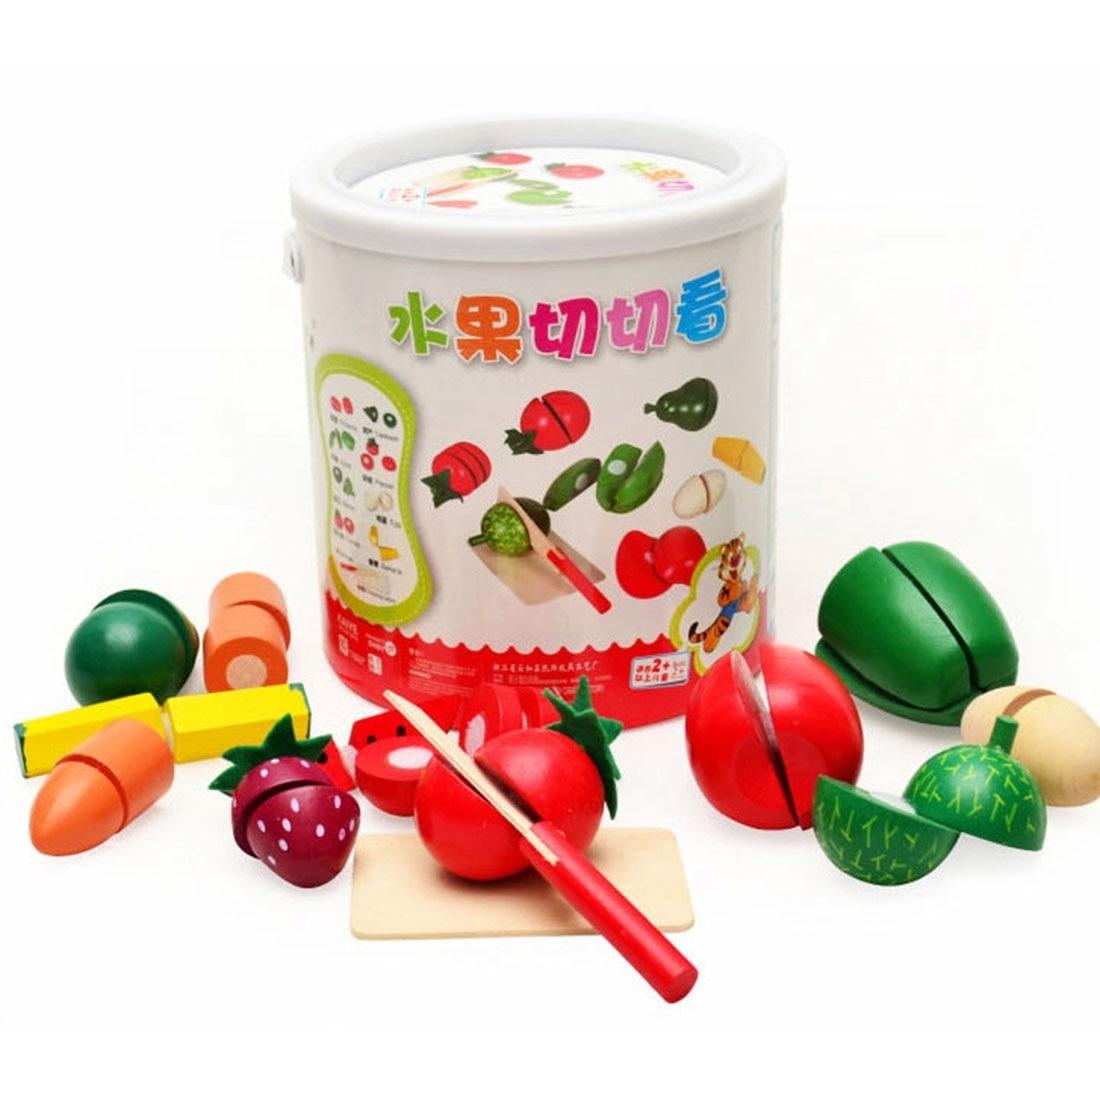 Surwish Sayuran Buah Kitchen Cutting Mainan Dengan Portabel Barel Kayu Puzzle Stiker Dan Sayur Cocina Juguete Brinquedo Kacang Kacangan Buahan Pemotong Plastik